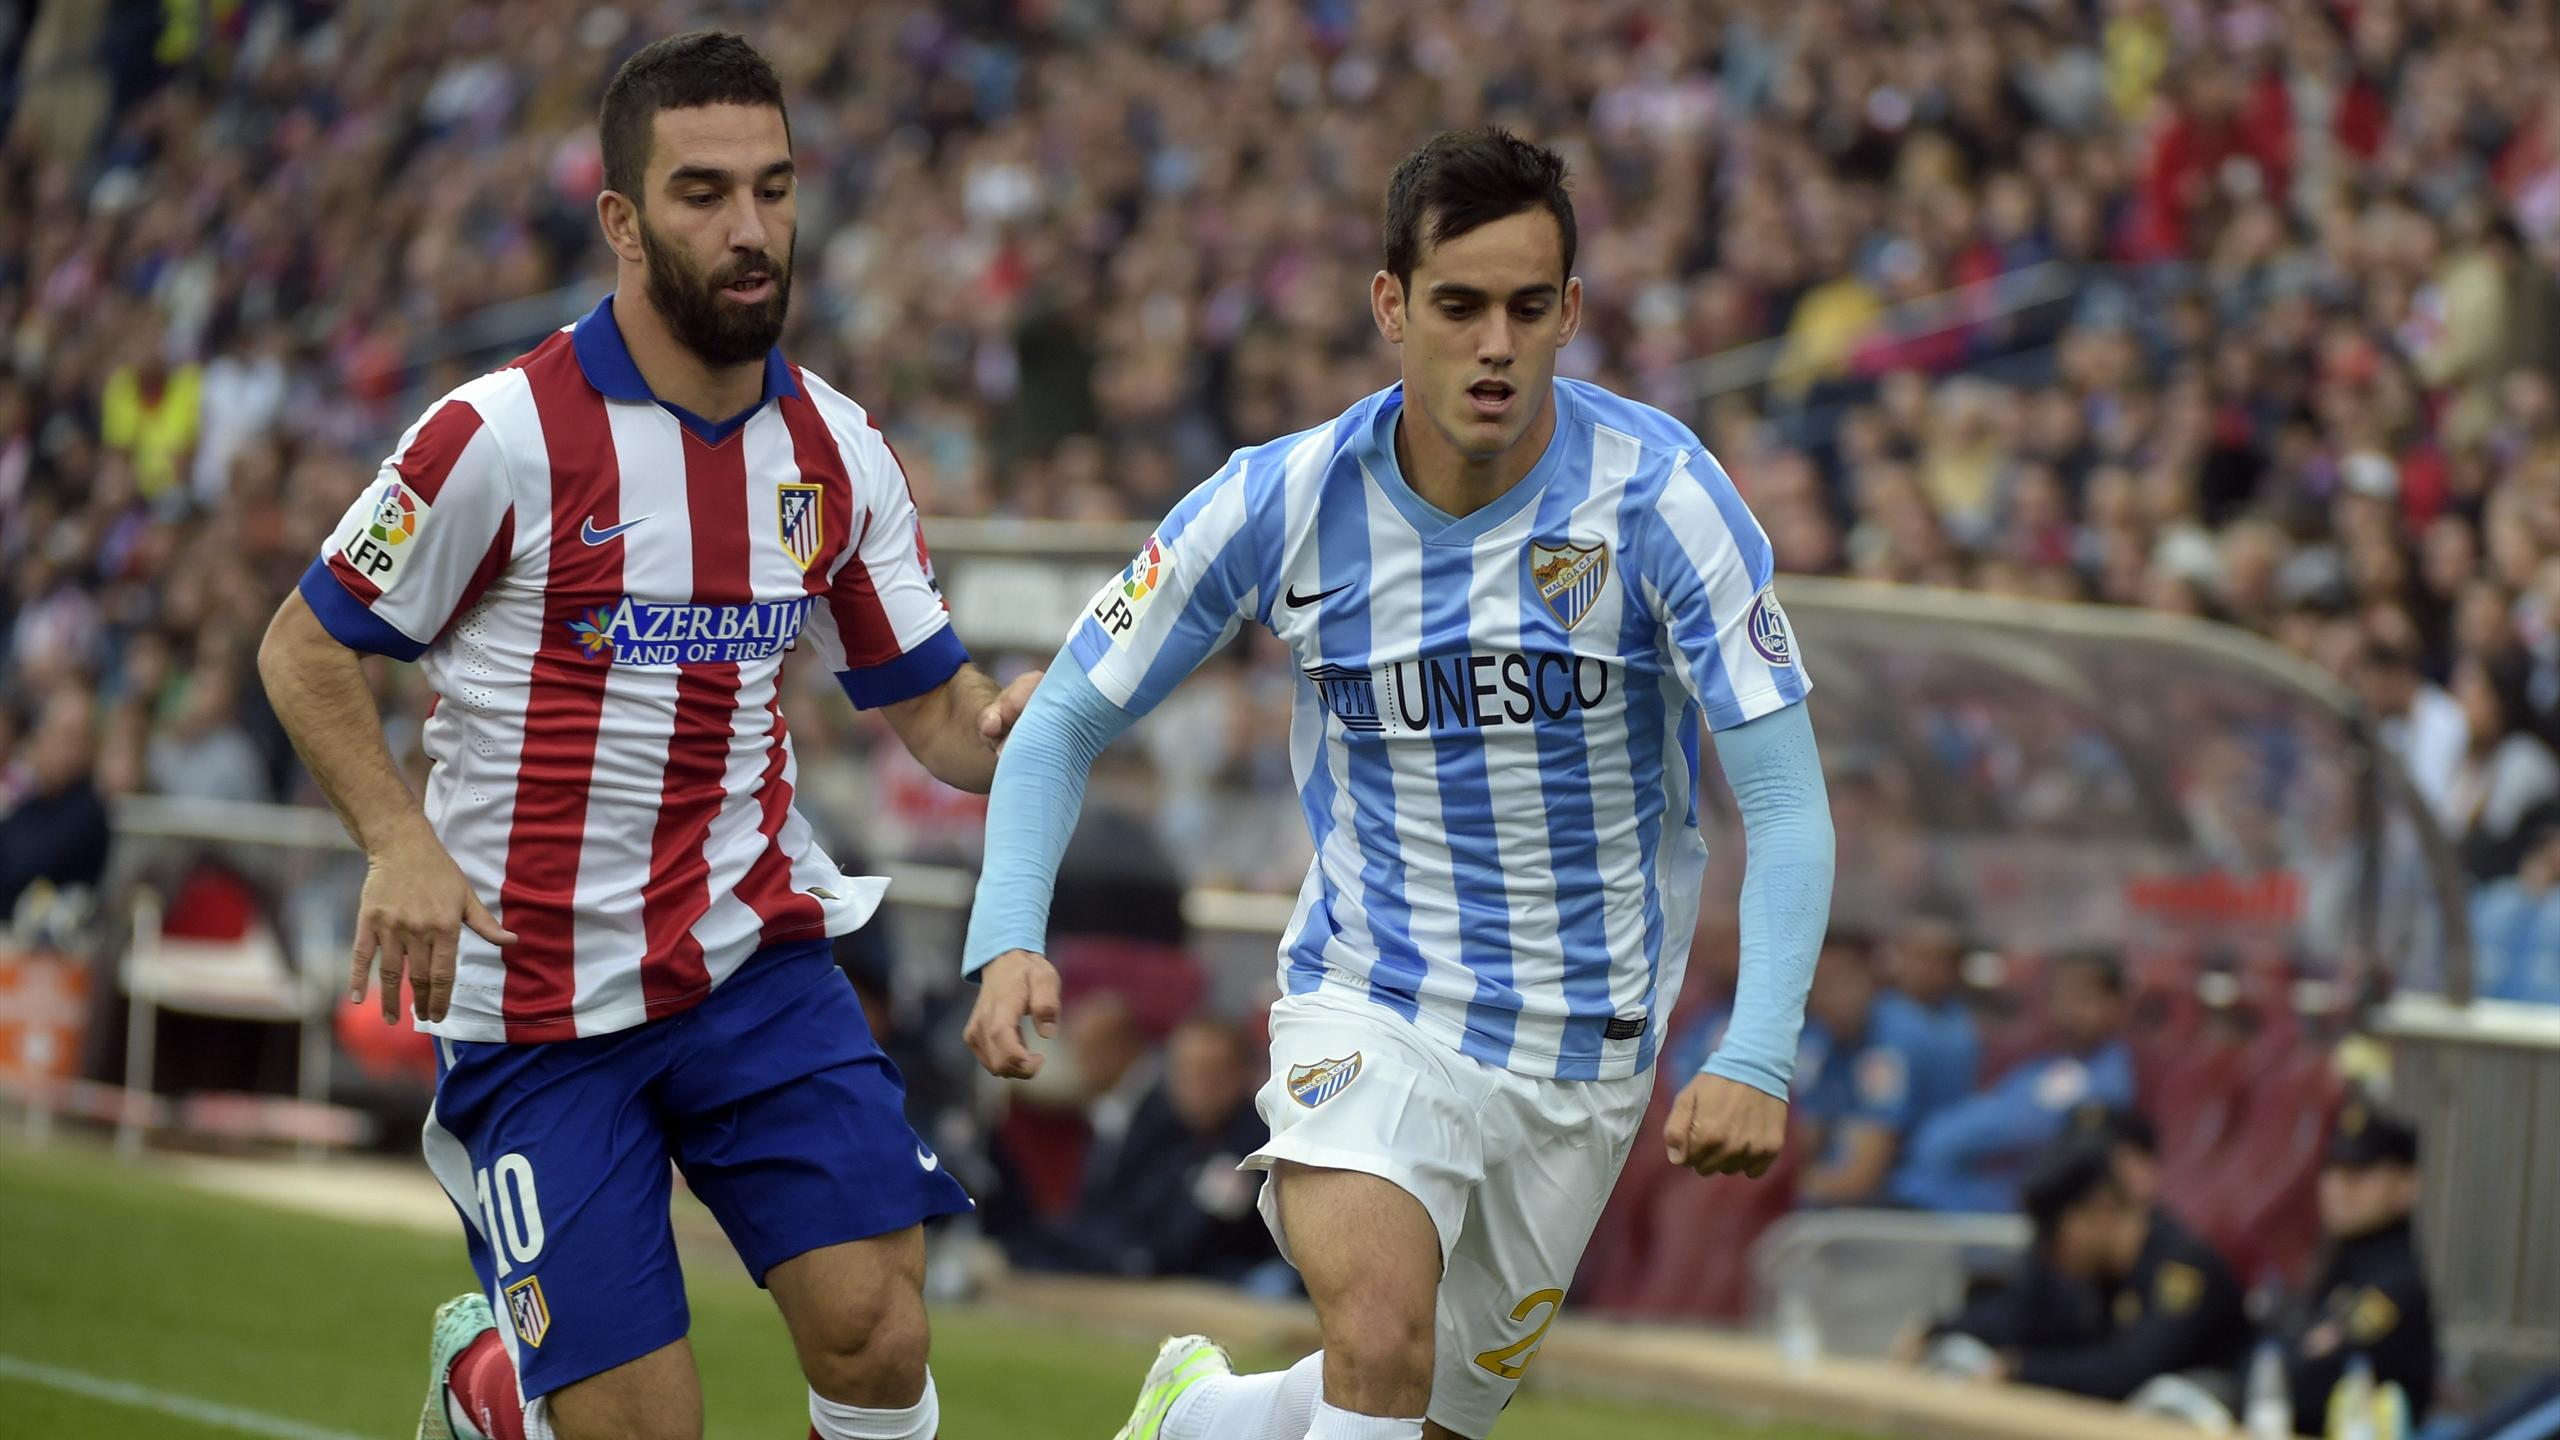 Malaga forward Juanmi is tracked by Atletico Madrid's Arda Turan